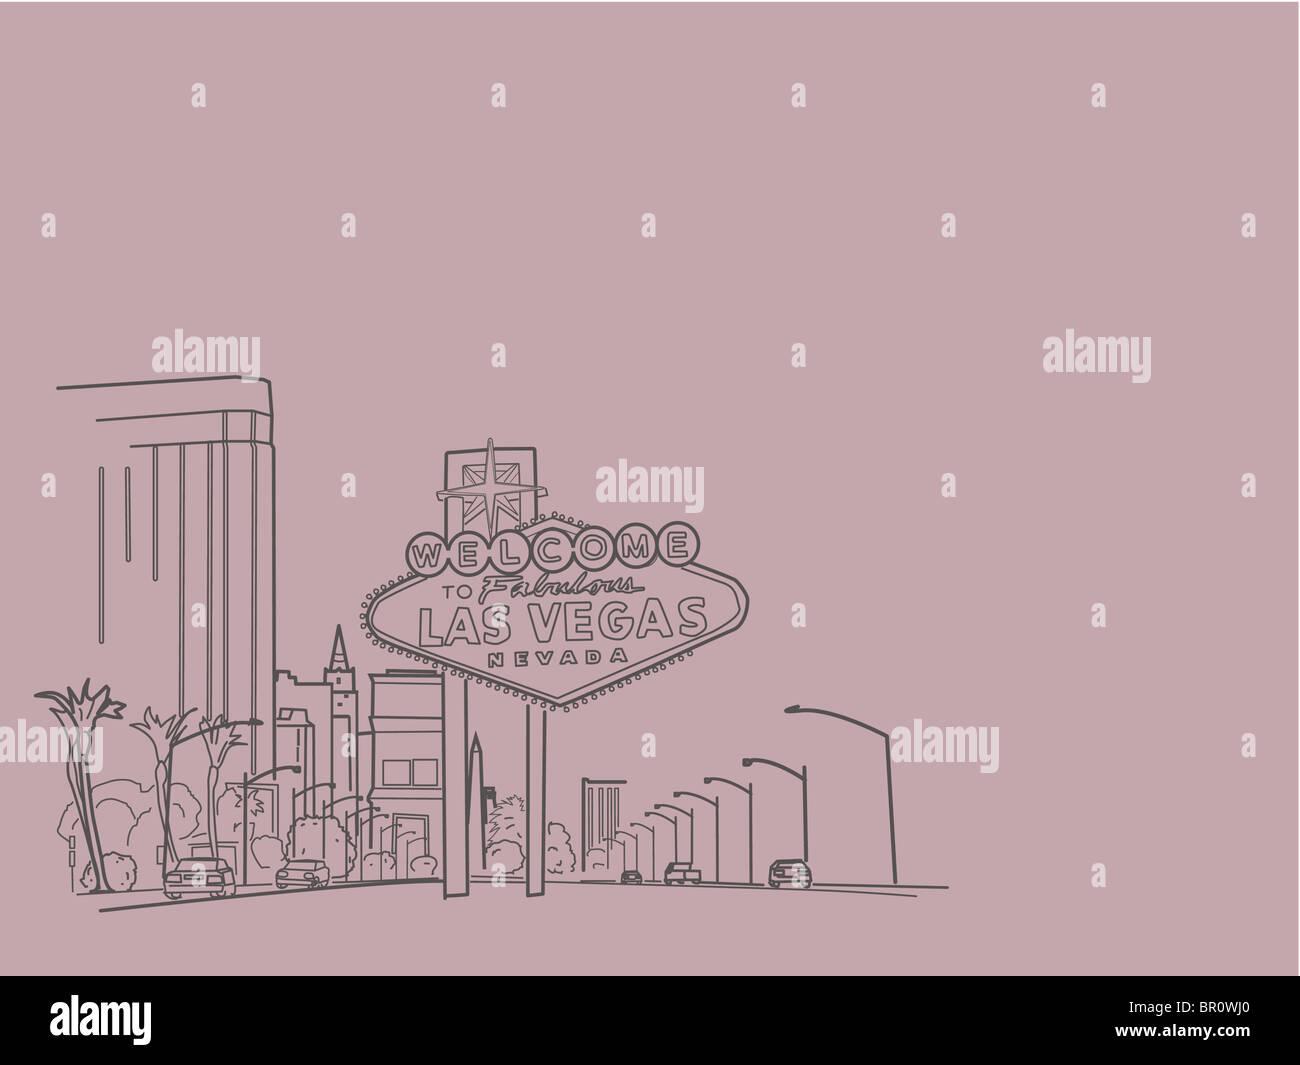 An illustration of city of Las vegas - Stock Image